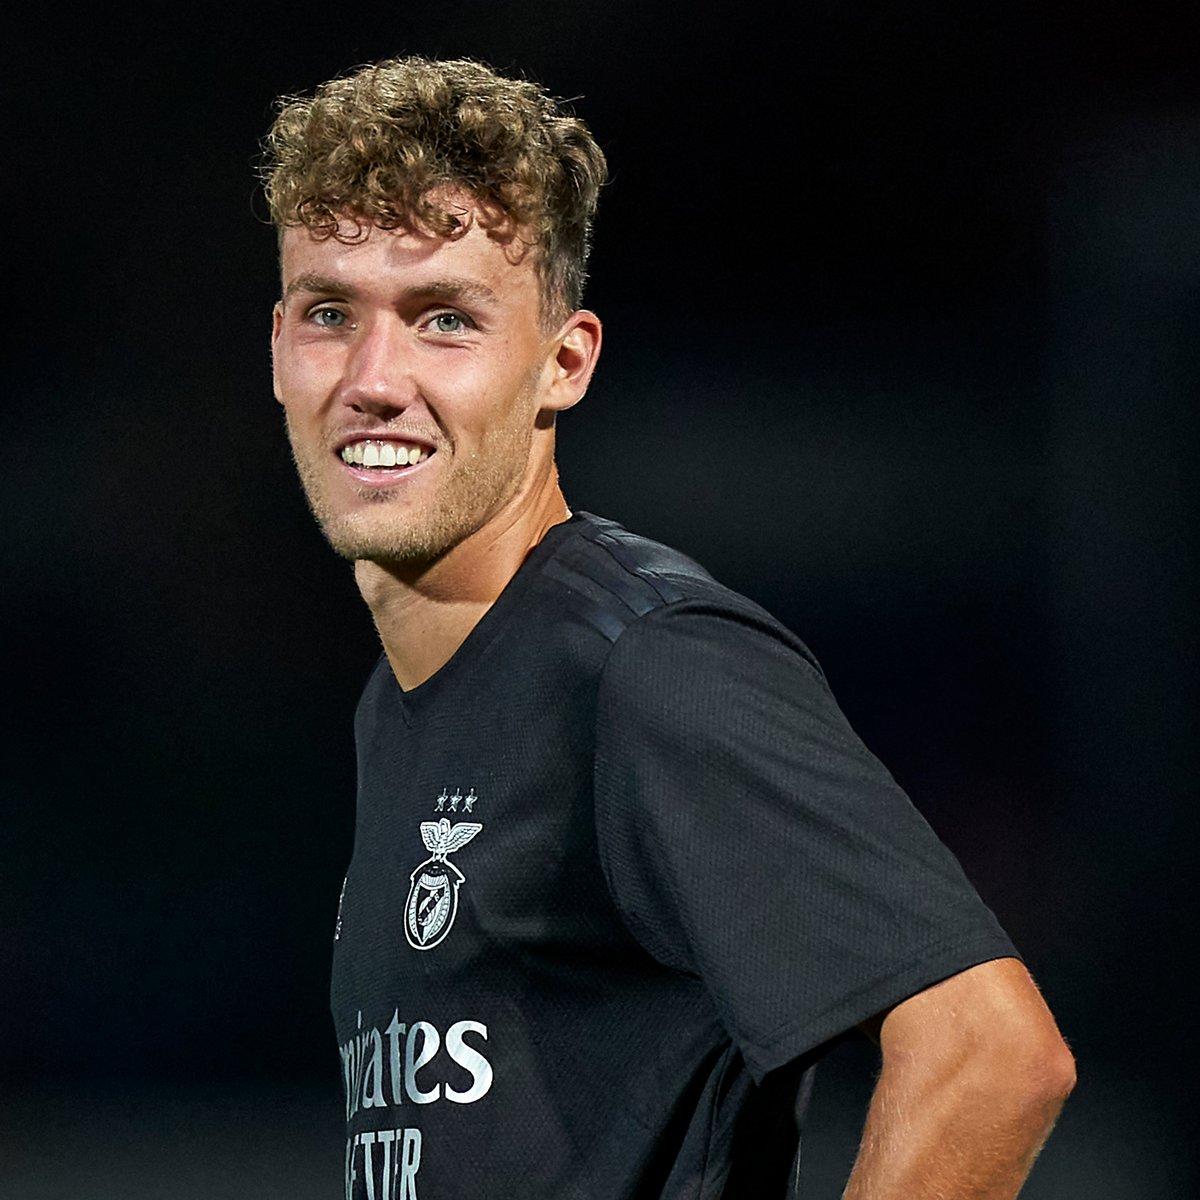 🦅 Benfica off to a strong start in the Portuguese Liga after beating Famalicão 5-1... 💪  ⚽️⚽️ Waldschmidt ⚽️ Everton ⚽️ Grimaldo ⚽️ Rafa Silva  #UEL | #MondayMotivation https://t.co/t9QNXa2d0r